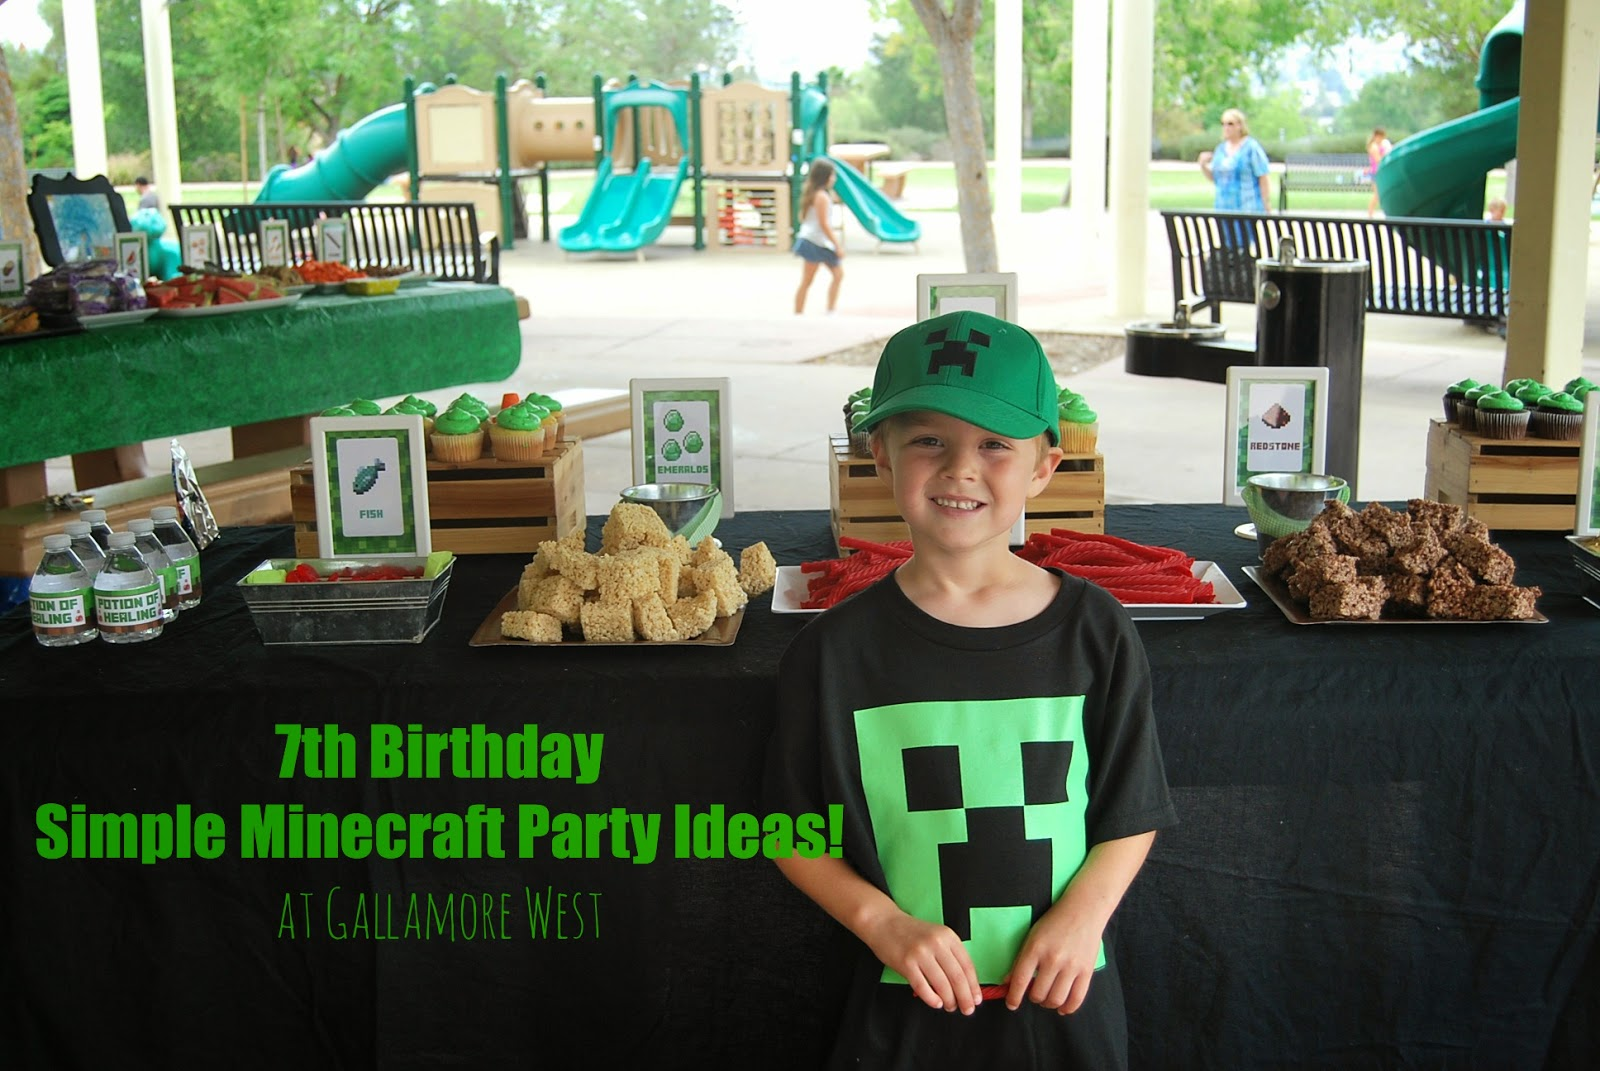 Mine craft birthday ideas - Minecraft Party Ideas At Www Gallamorewest Com